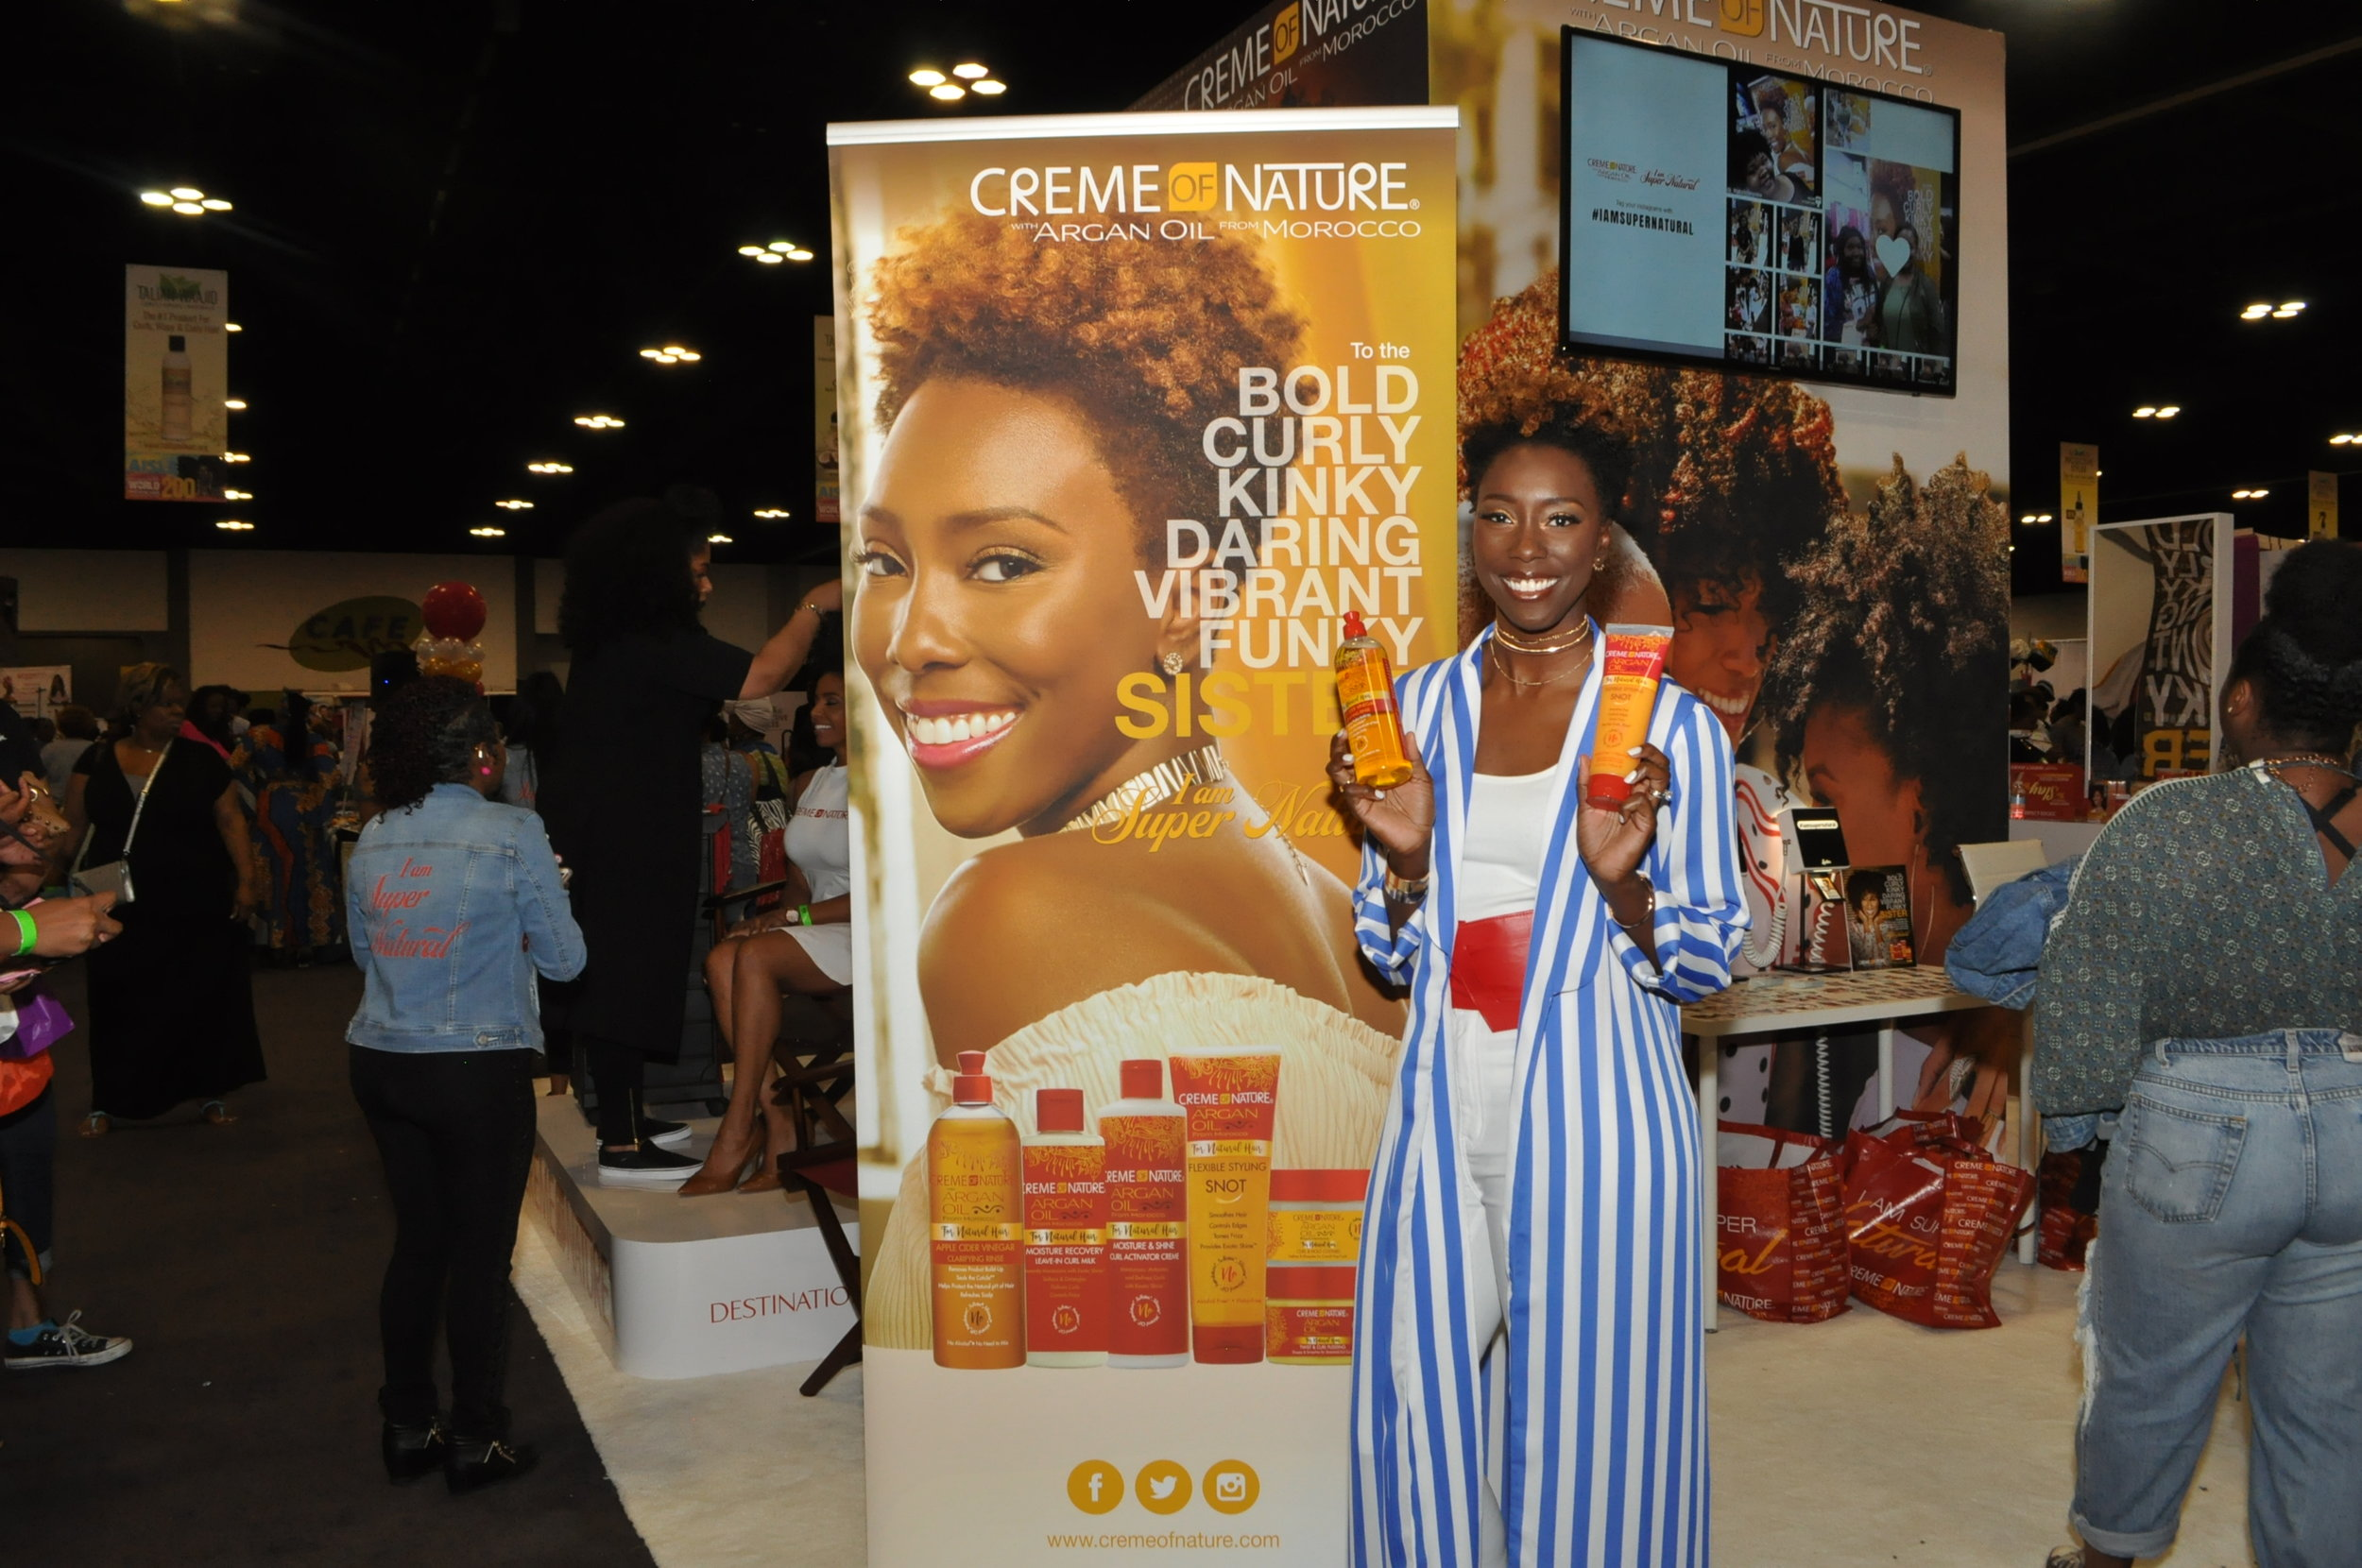 dayna-bolden-world-natural-hair-show-creme-of-nature-super-natural5.jpg